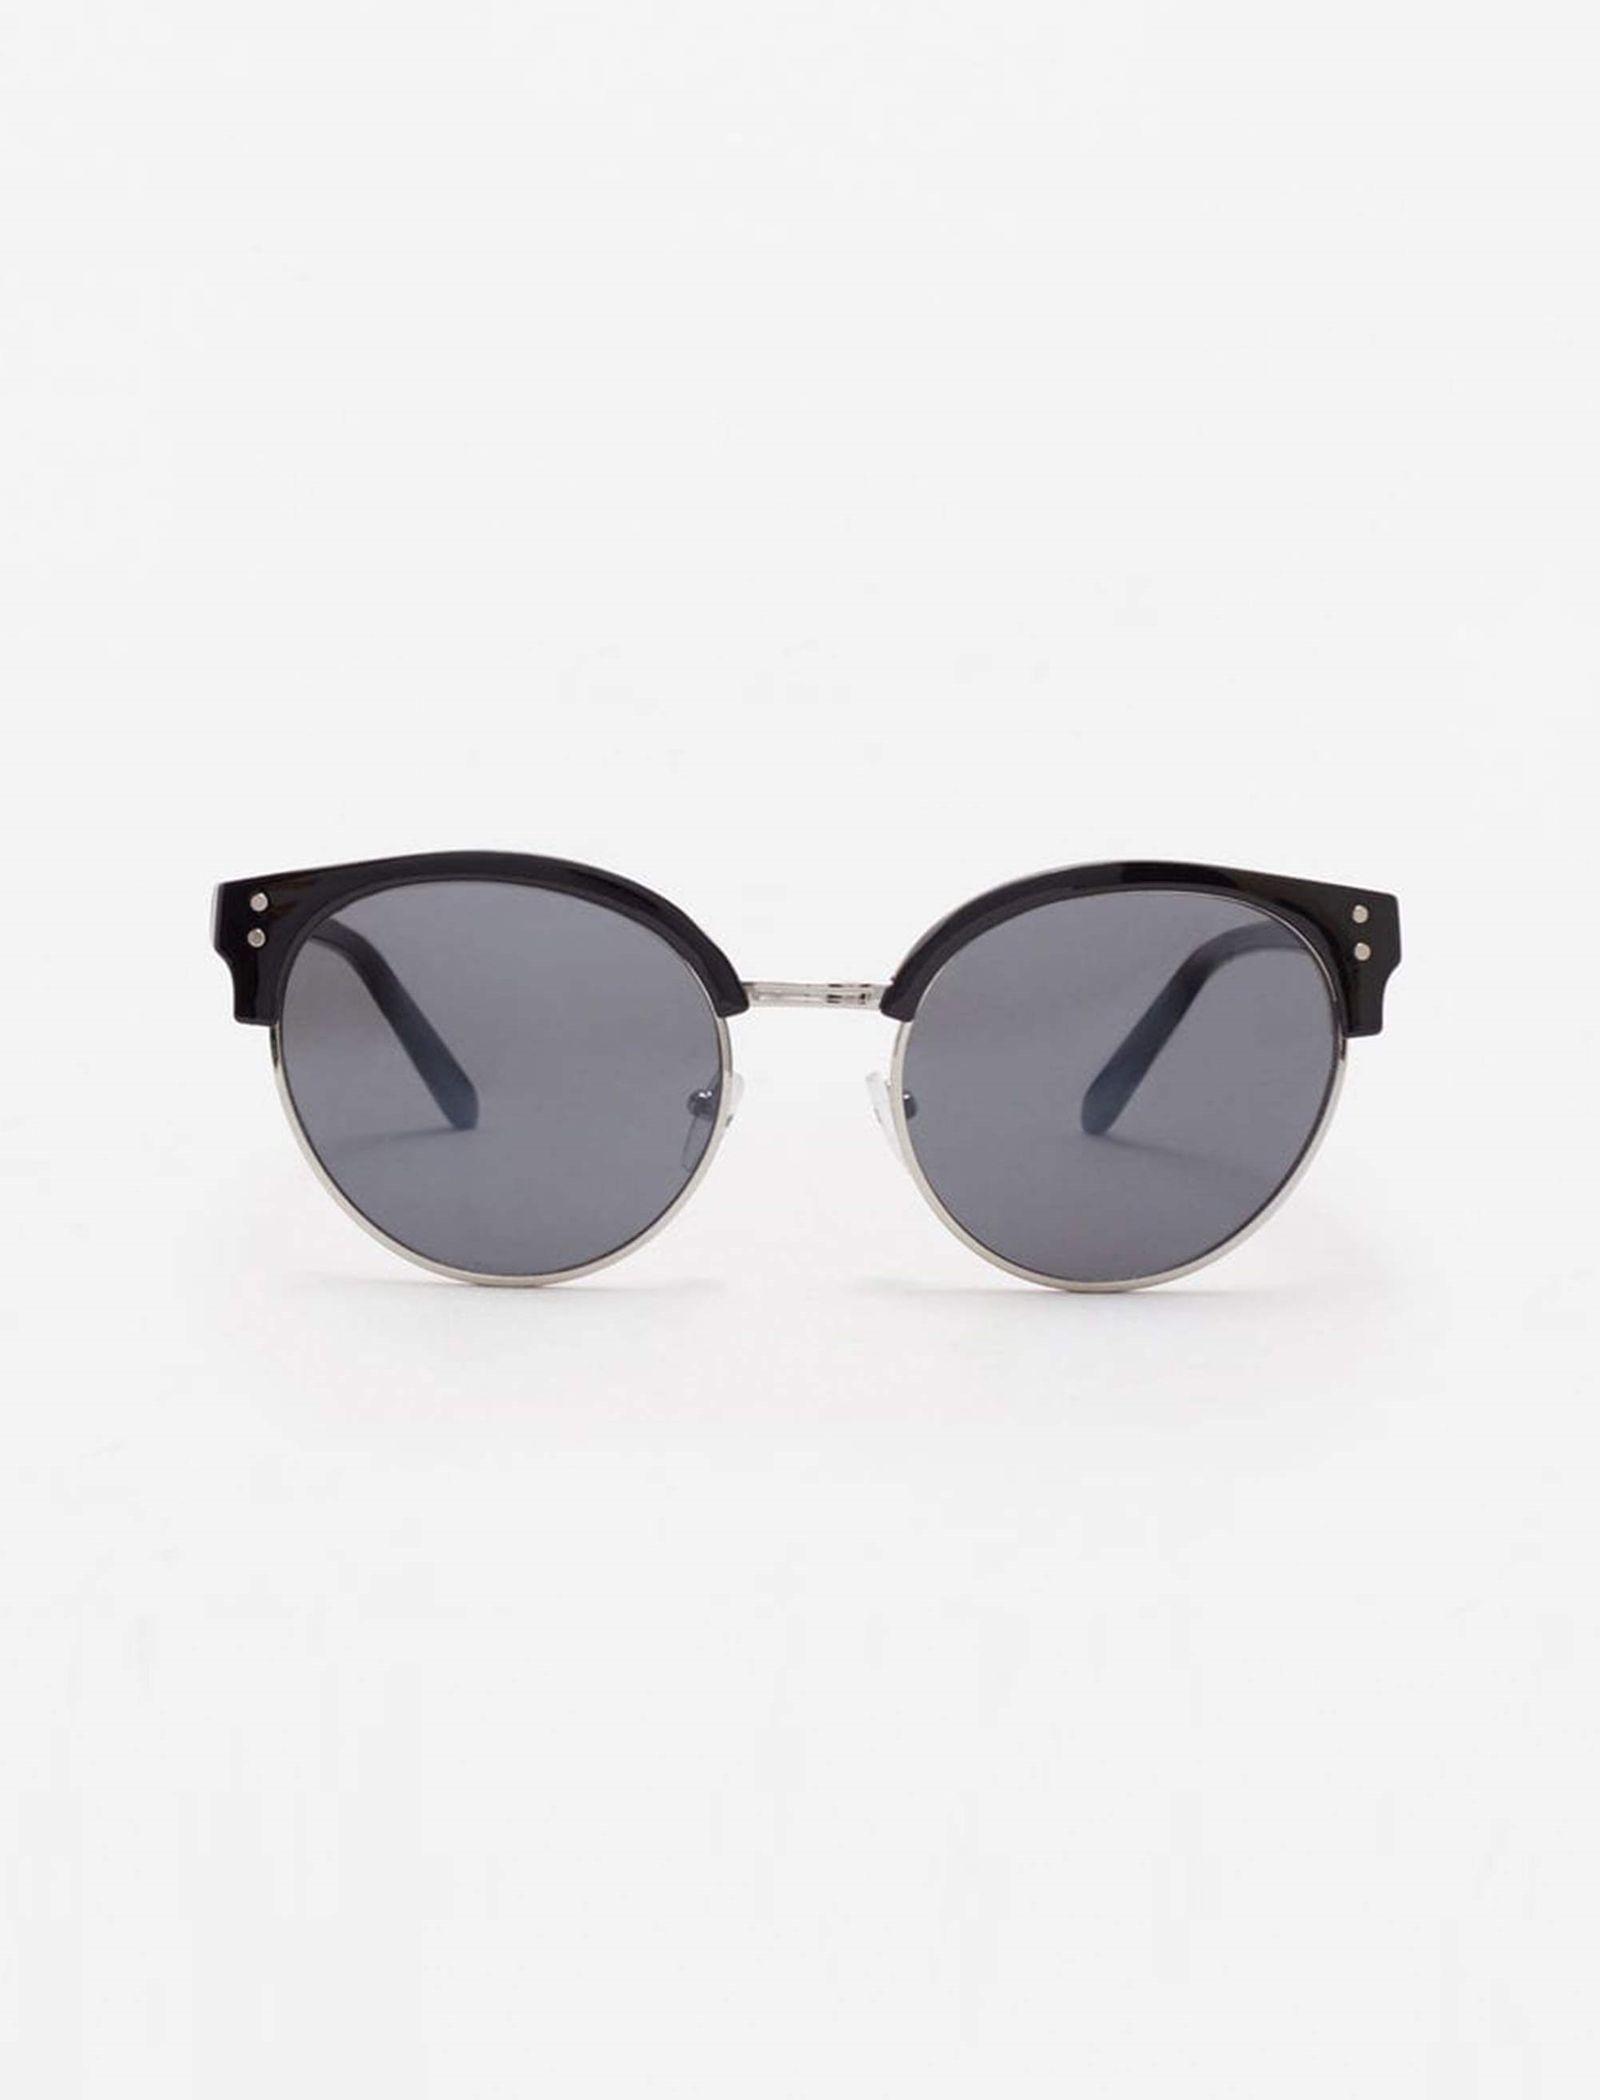 عینک آفتابی پنتوس زنانه - مانگو - مشکي - 1